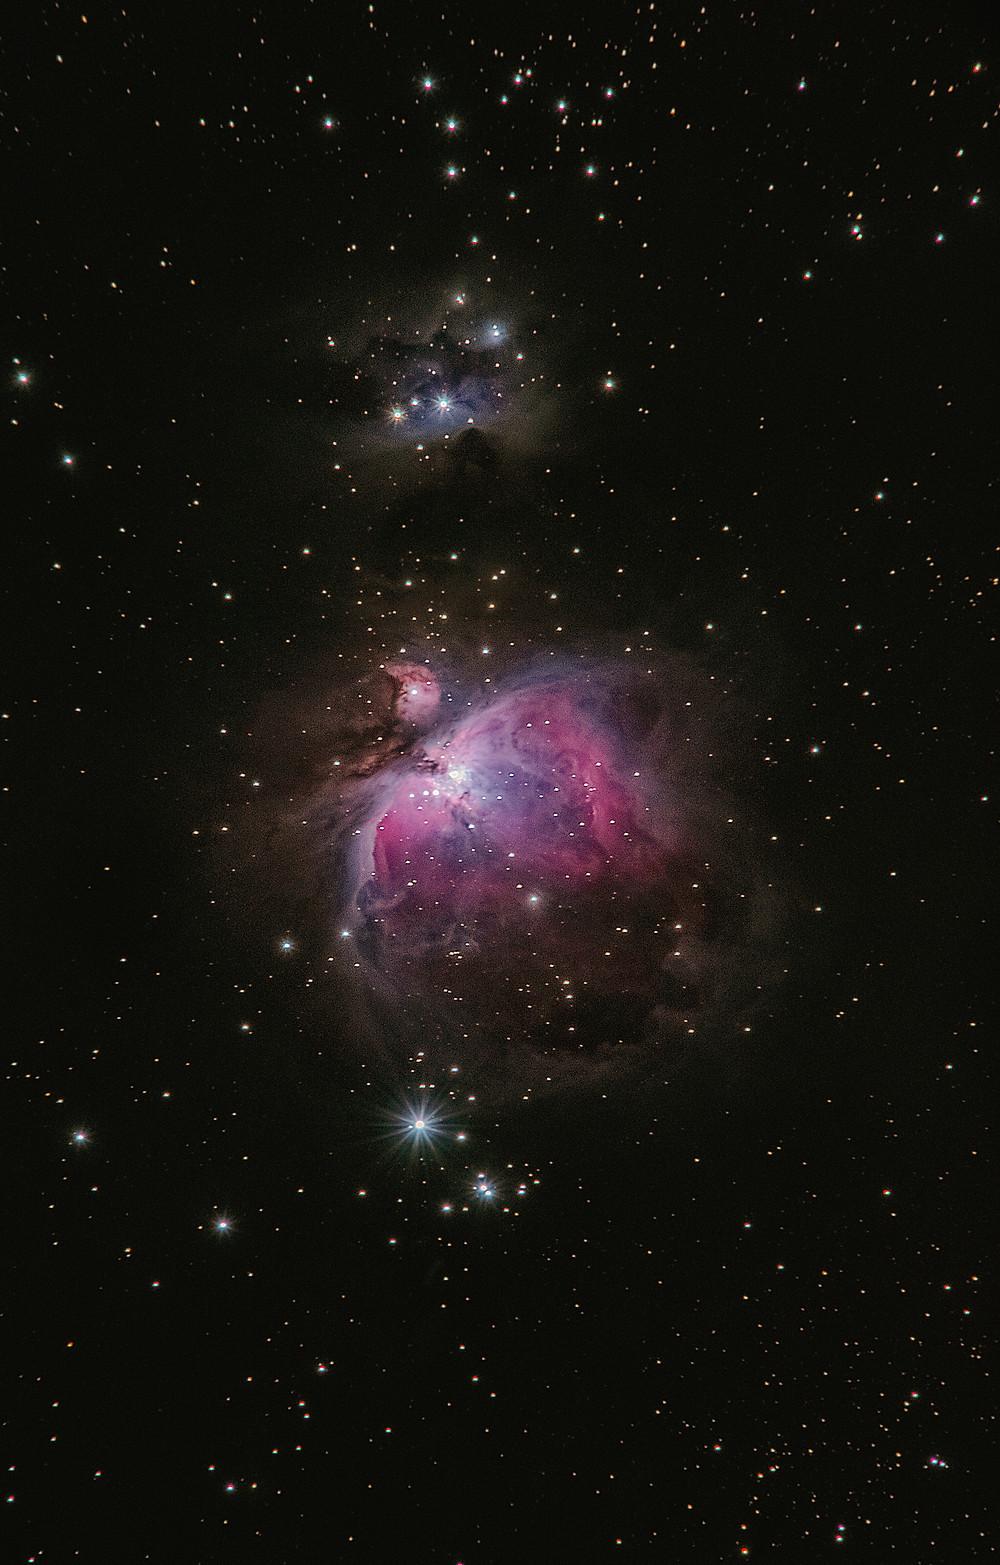 A Representational image of Galaxy